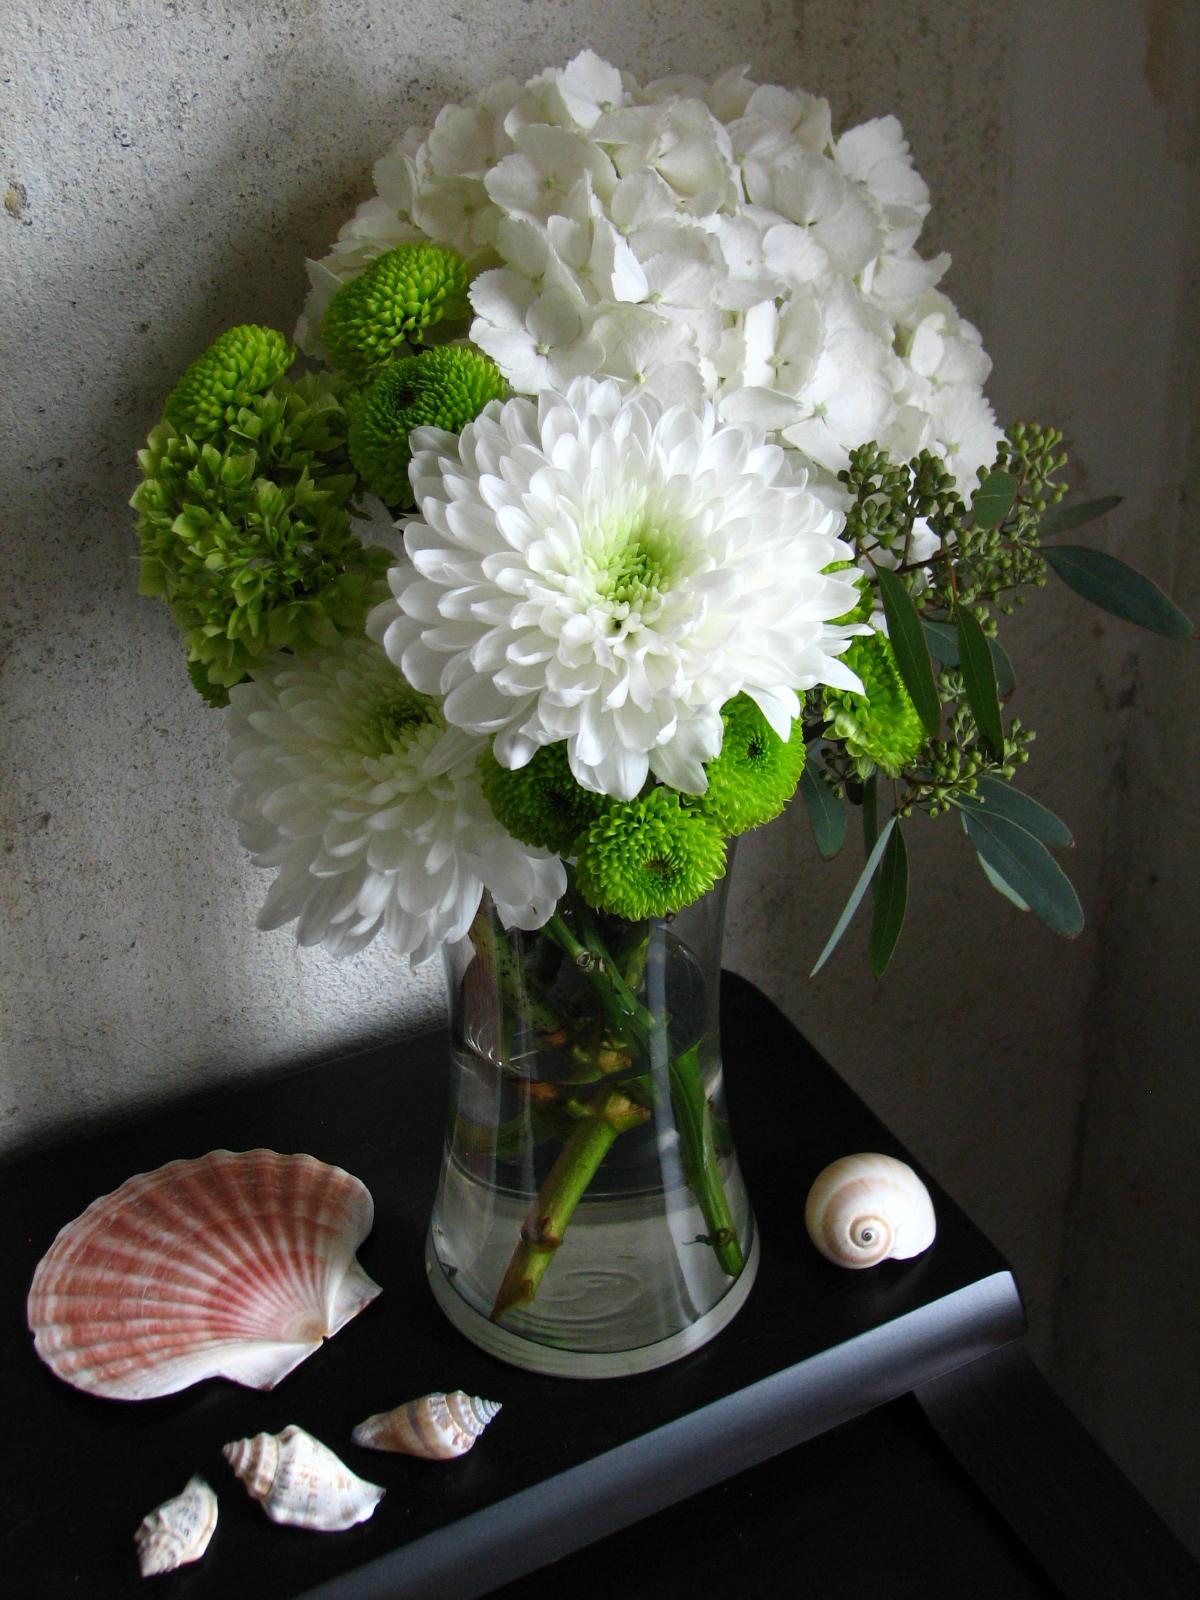 Floral design by molly lohman new arrangements for Beach house designs florist